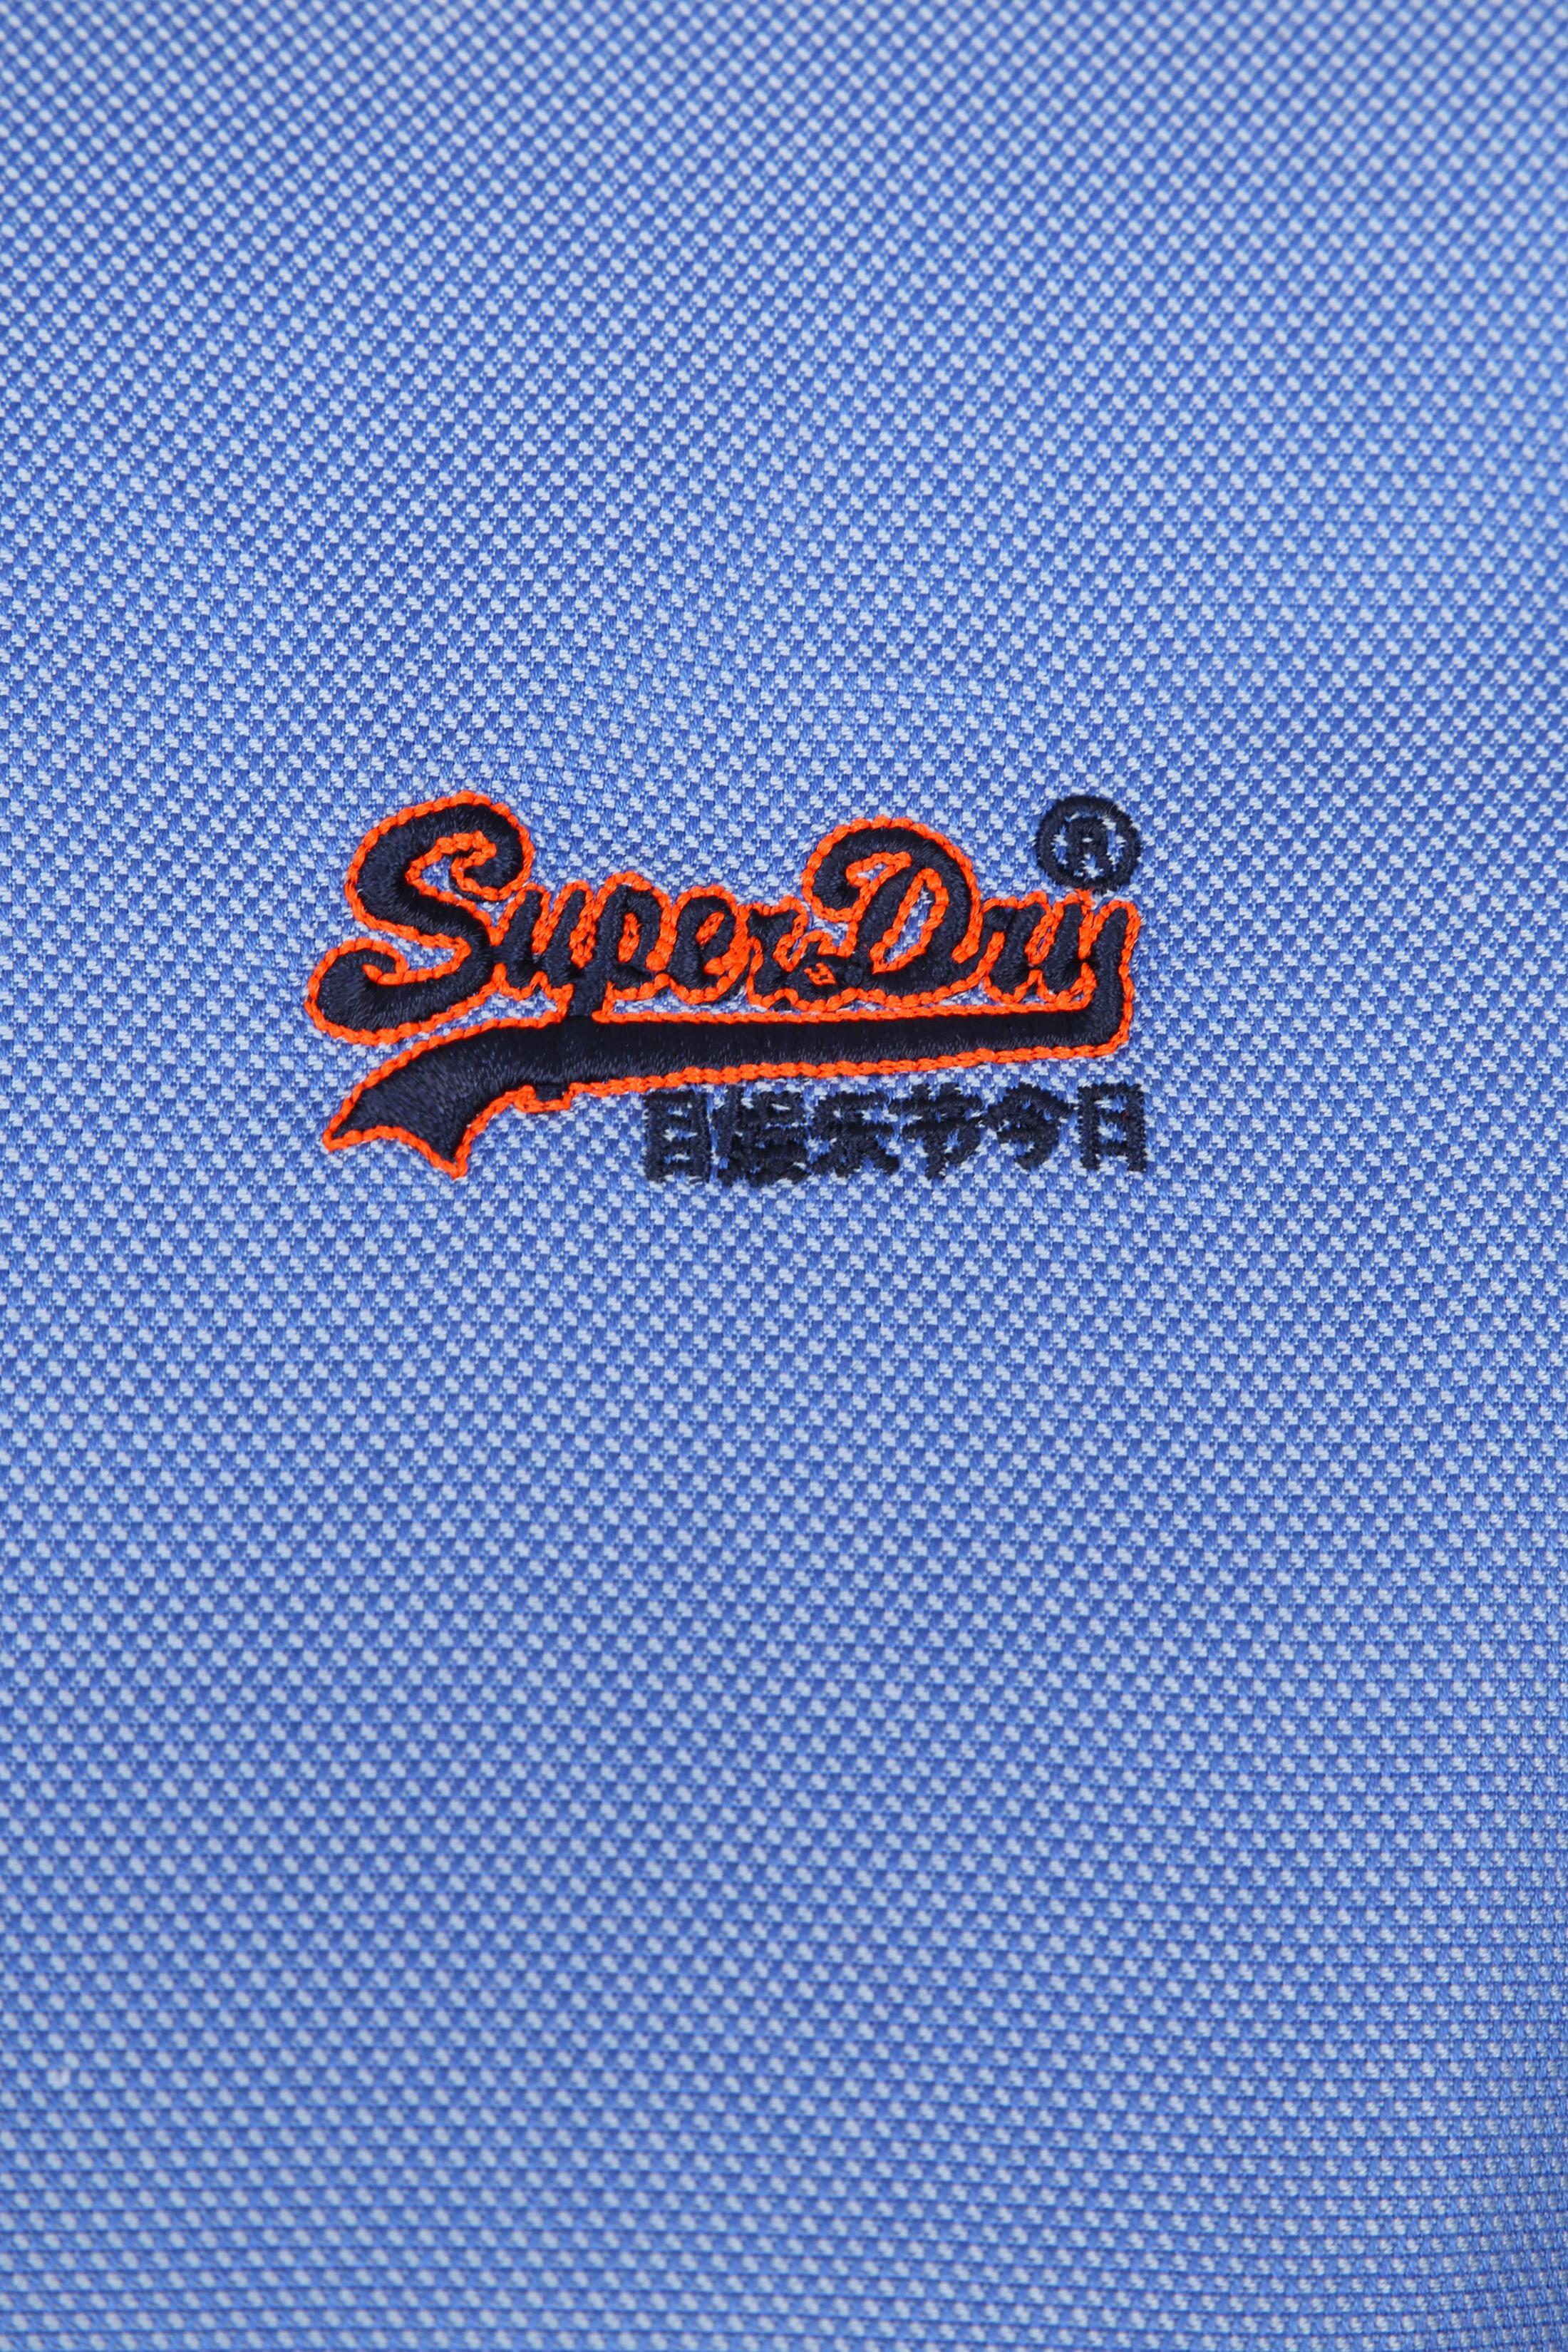 Superdry Overhemd Blauw foto 1